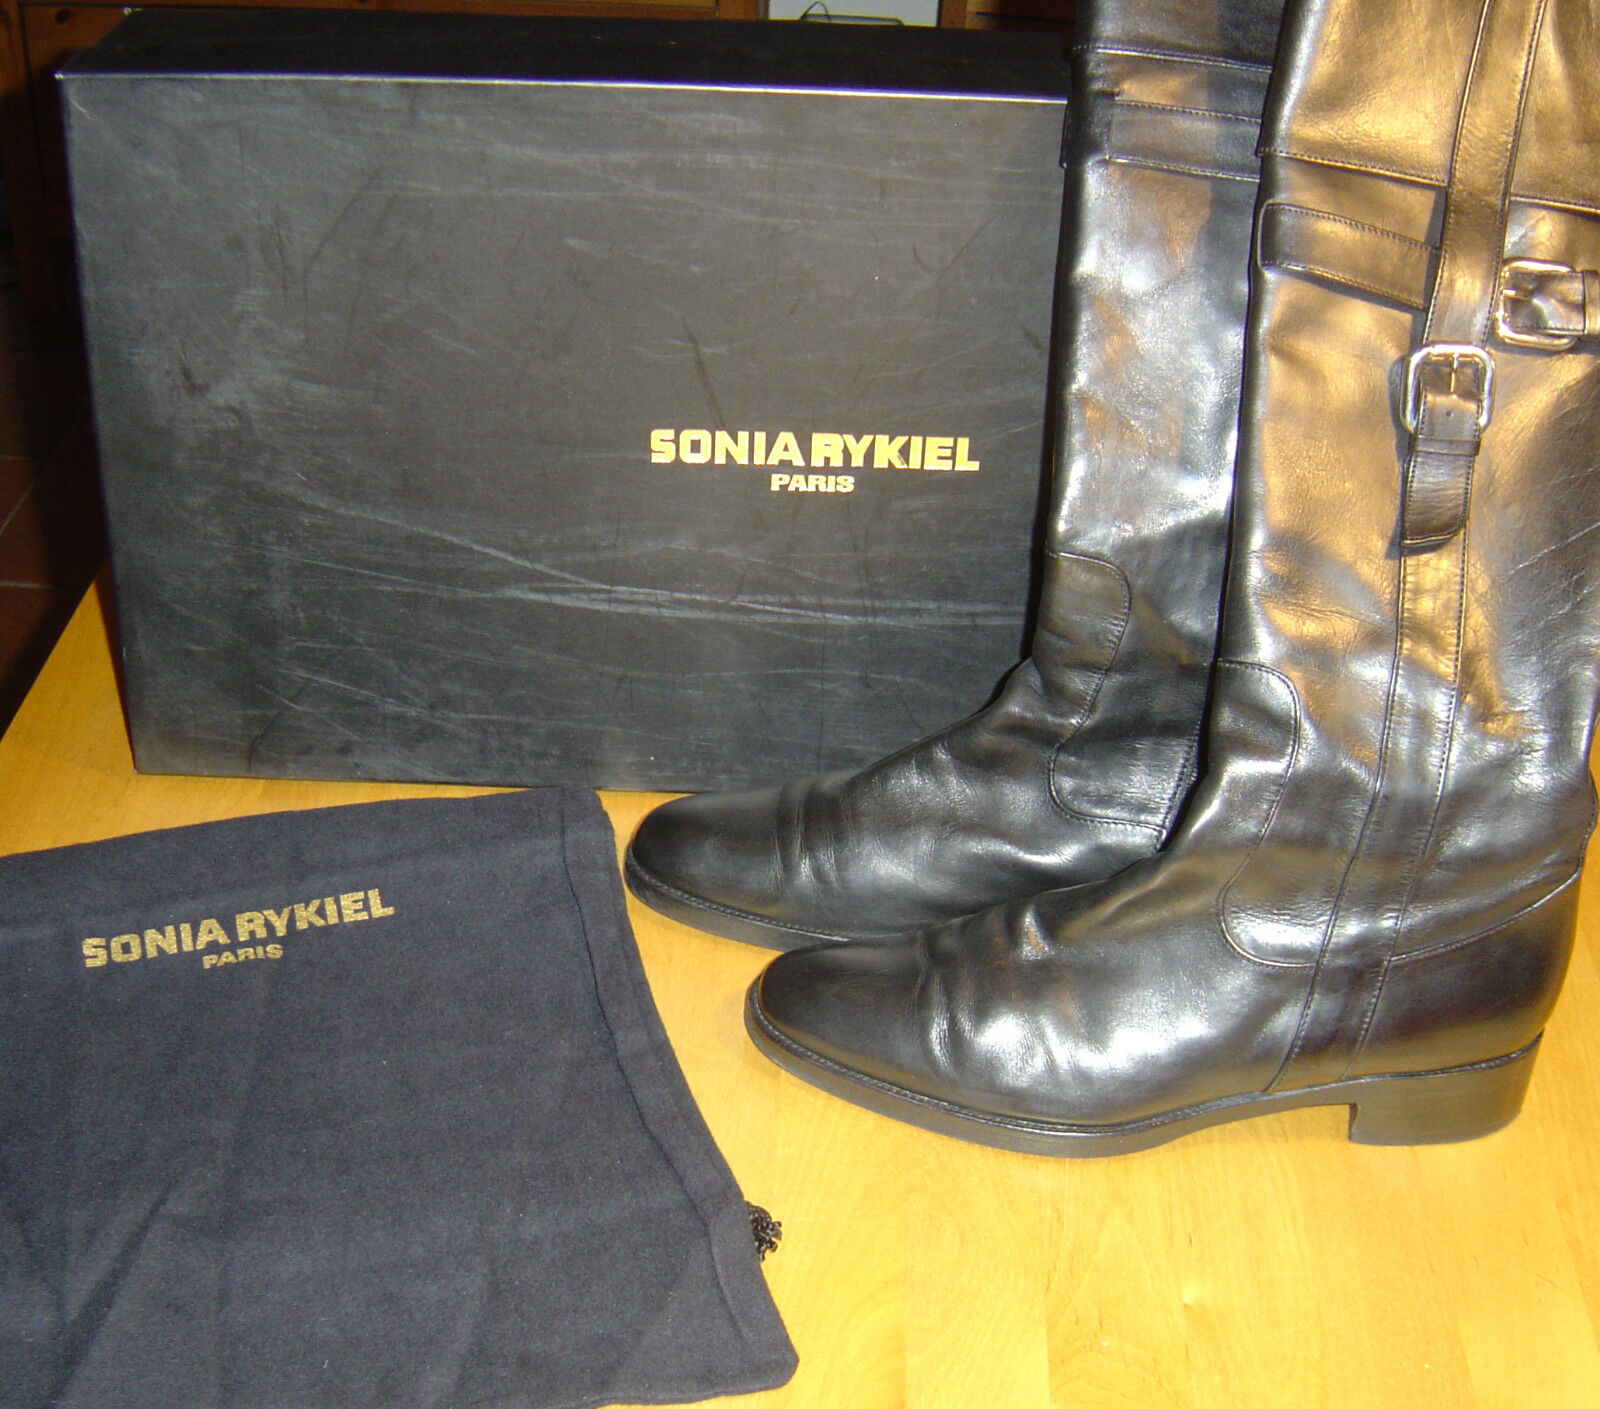 Original Sonia Rykiel Paris Stiefel Lederstiefel Reiterstiefel Schwarz EUR 39,5